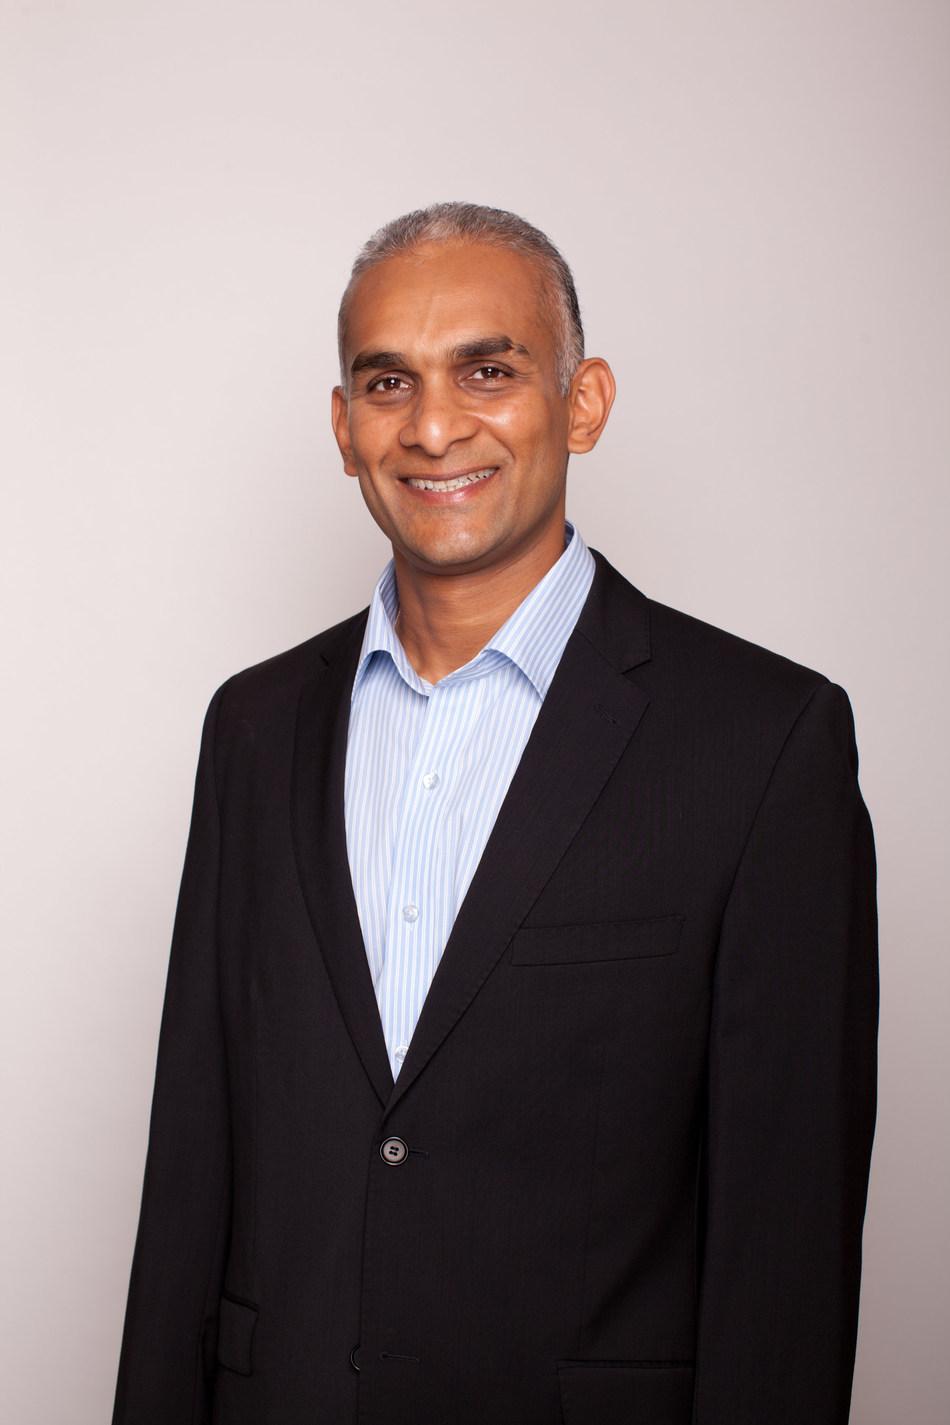 Roshan Mendis, senior vice-president of Sabre Travel Network, EMEA and APAC